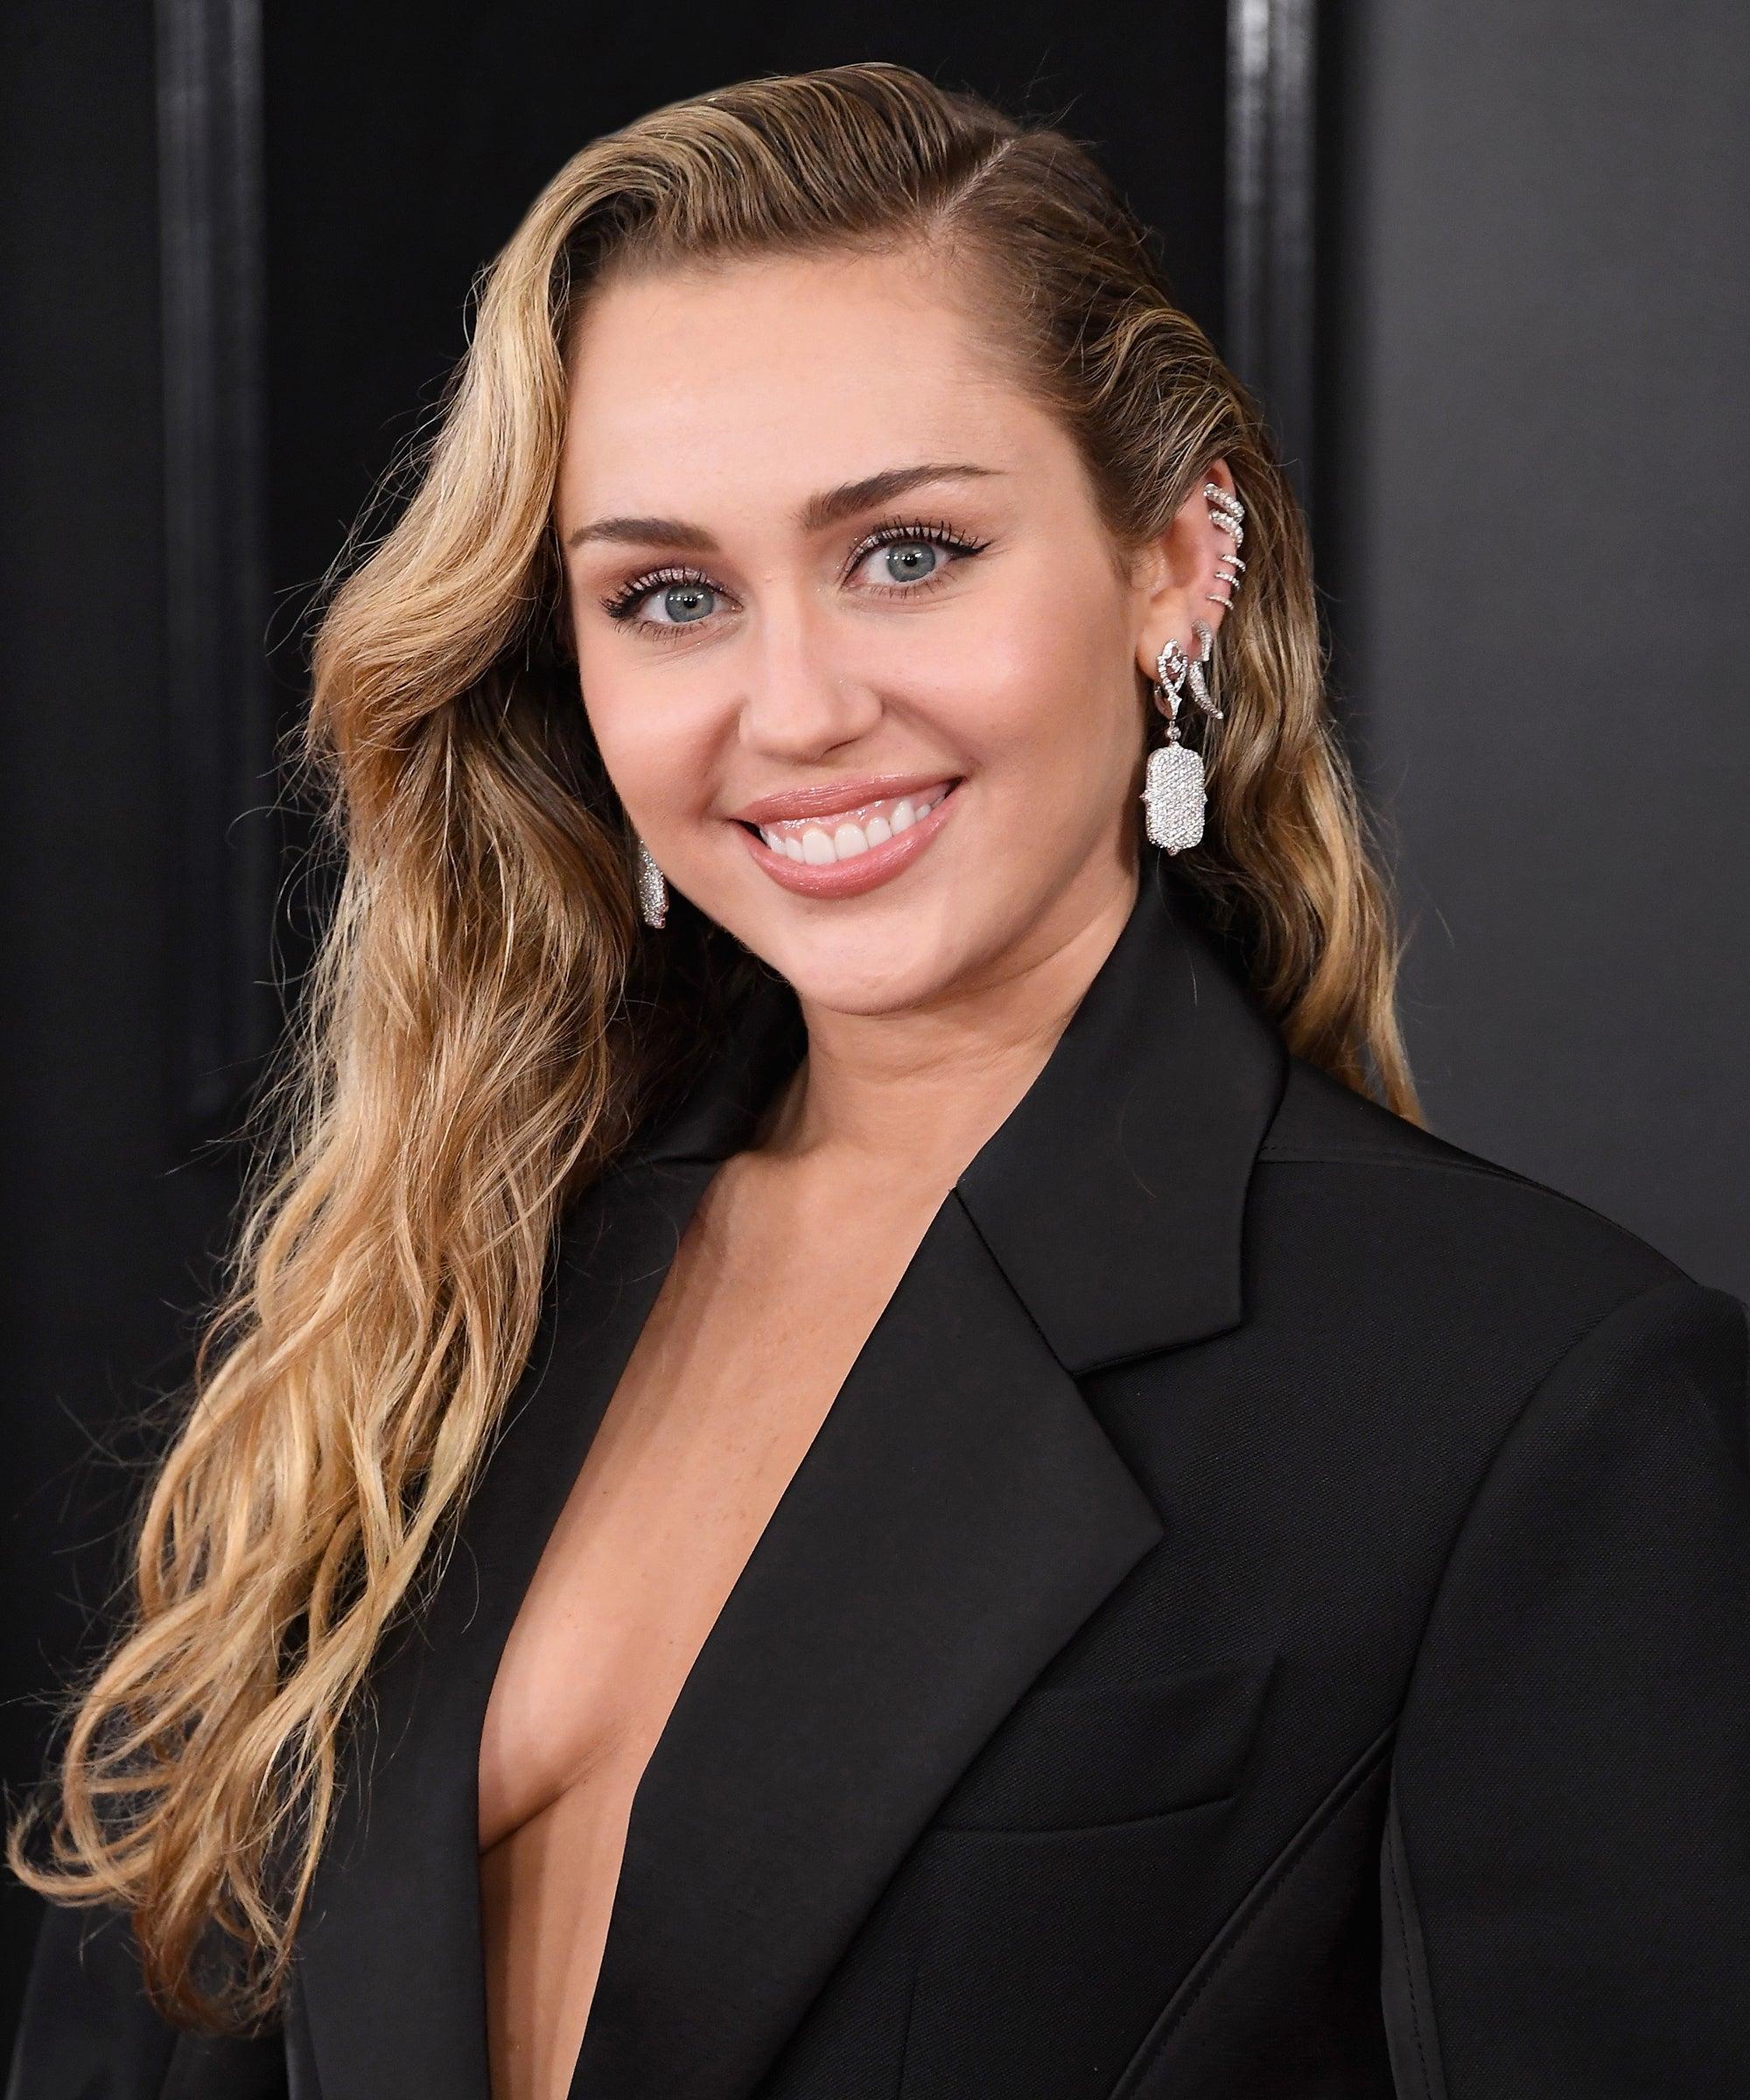 Miley Cyrus Got A Pixie Mullet Haircut